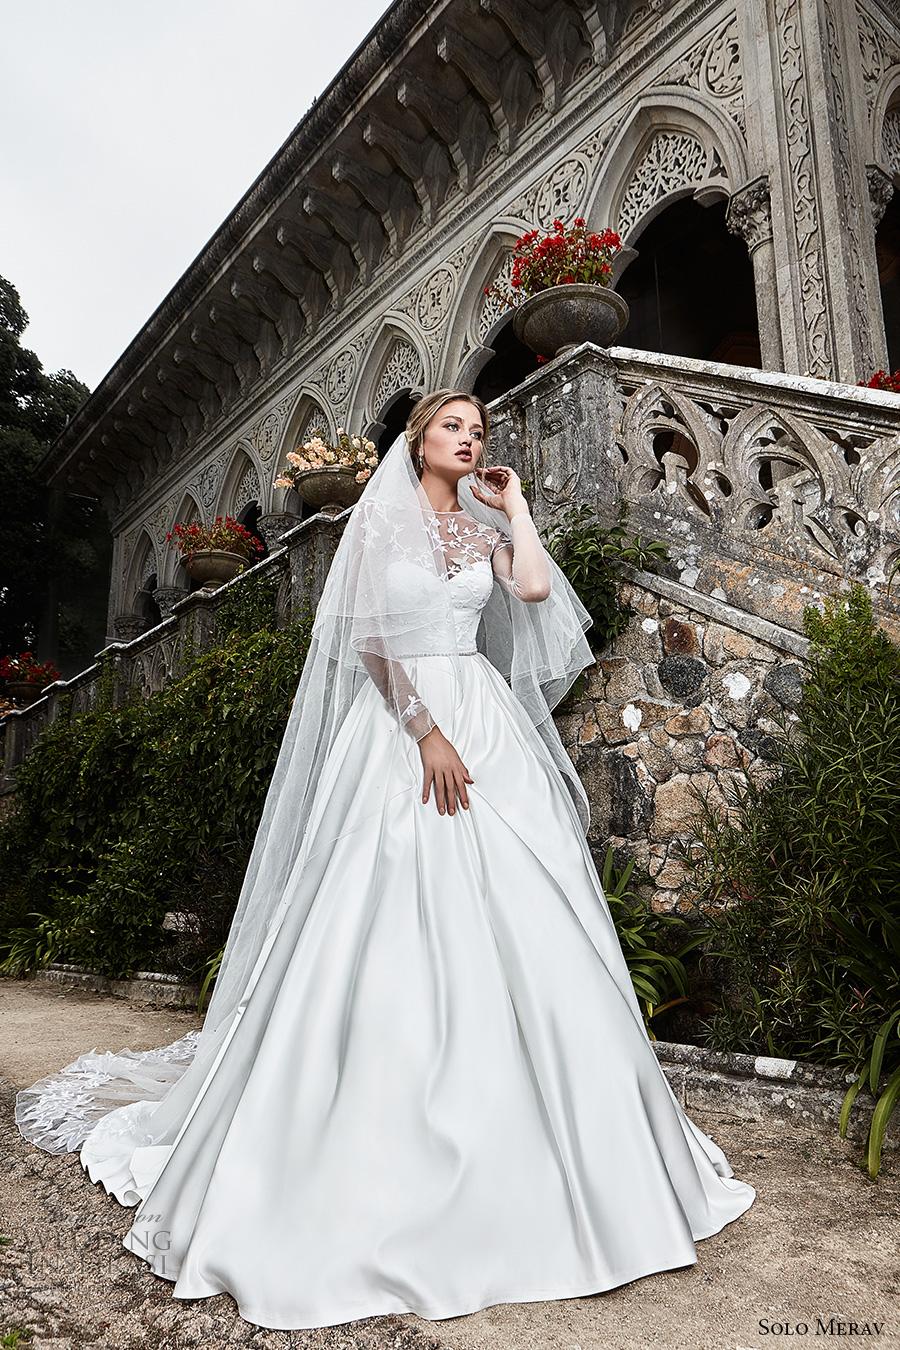 Solo merav 2017 wedding dresses games of lace bridal for Illusion sweetheart neckline wedding dress